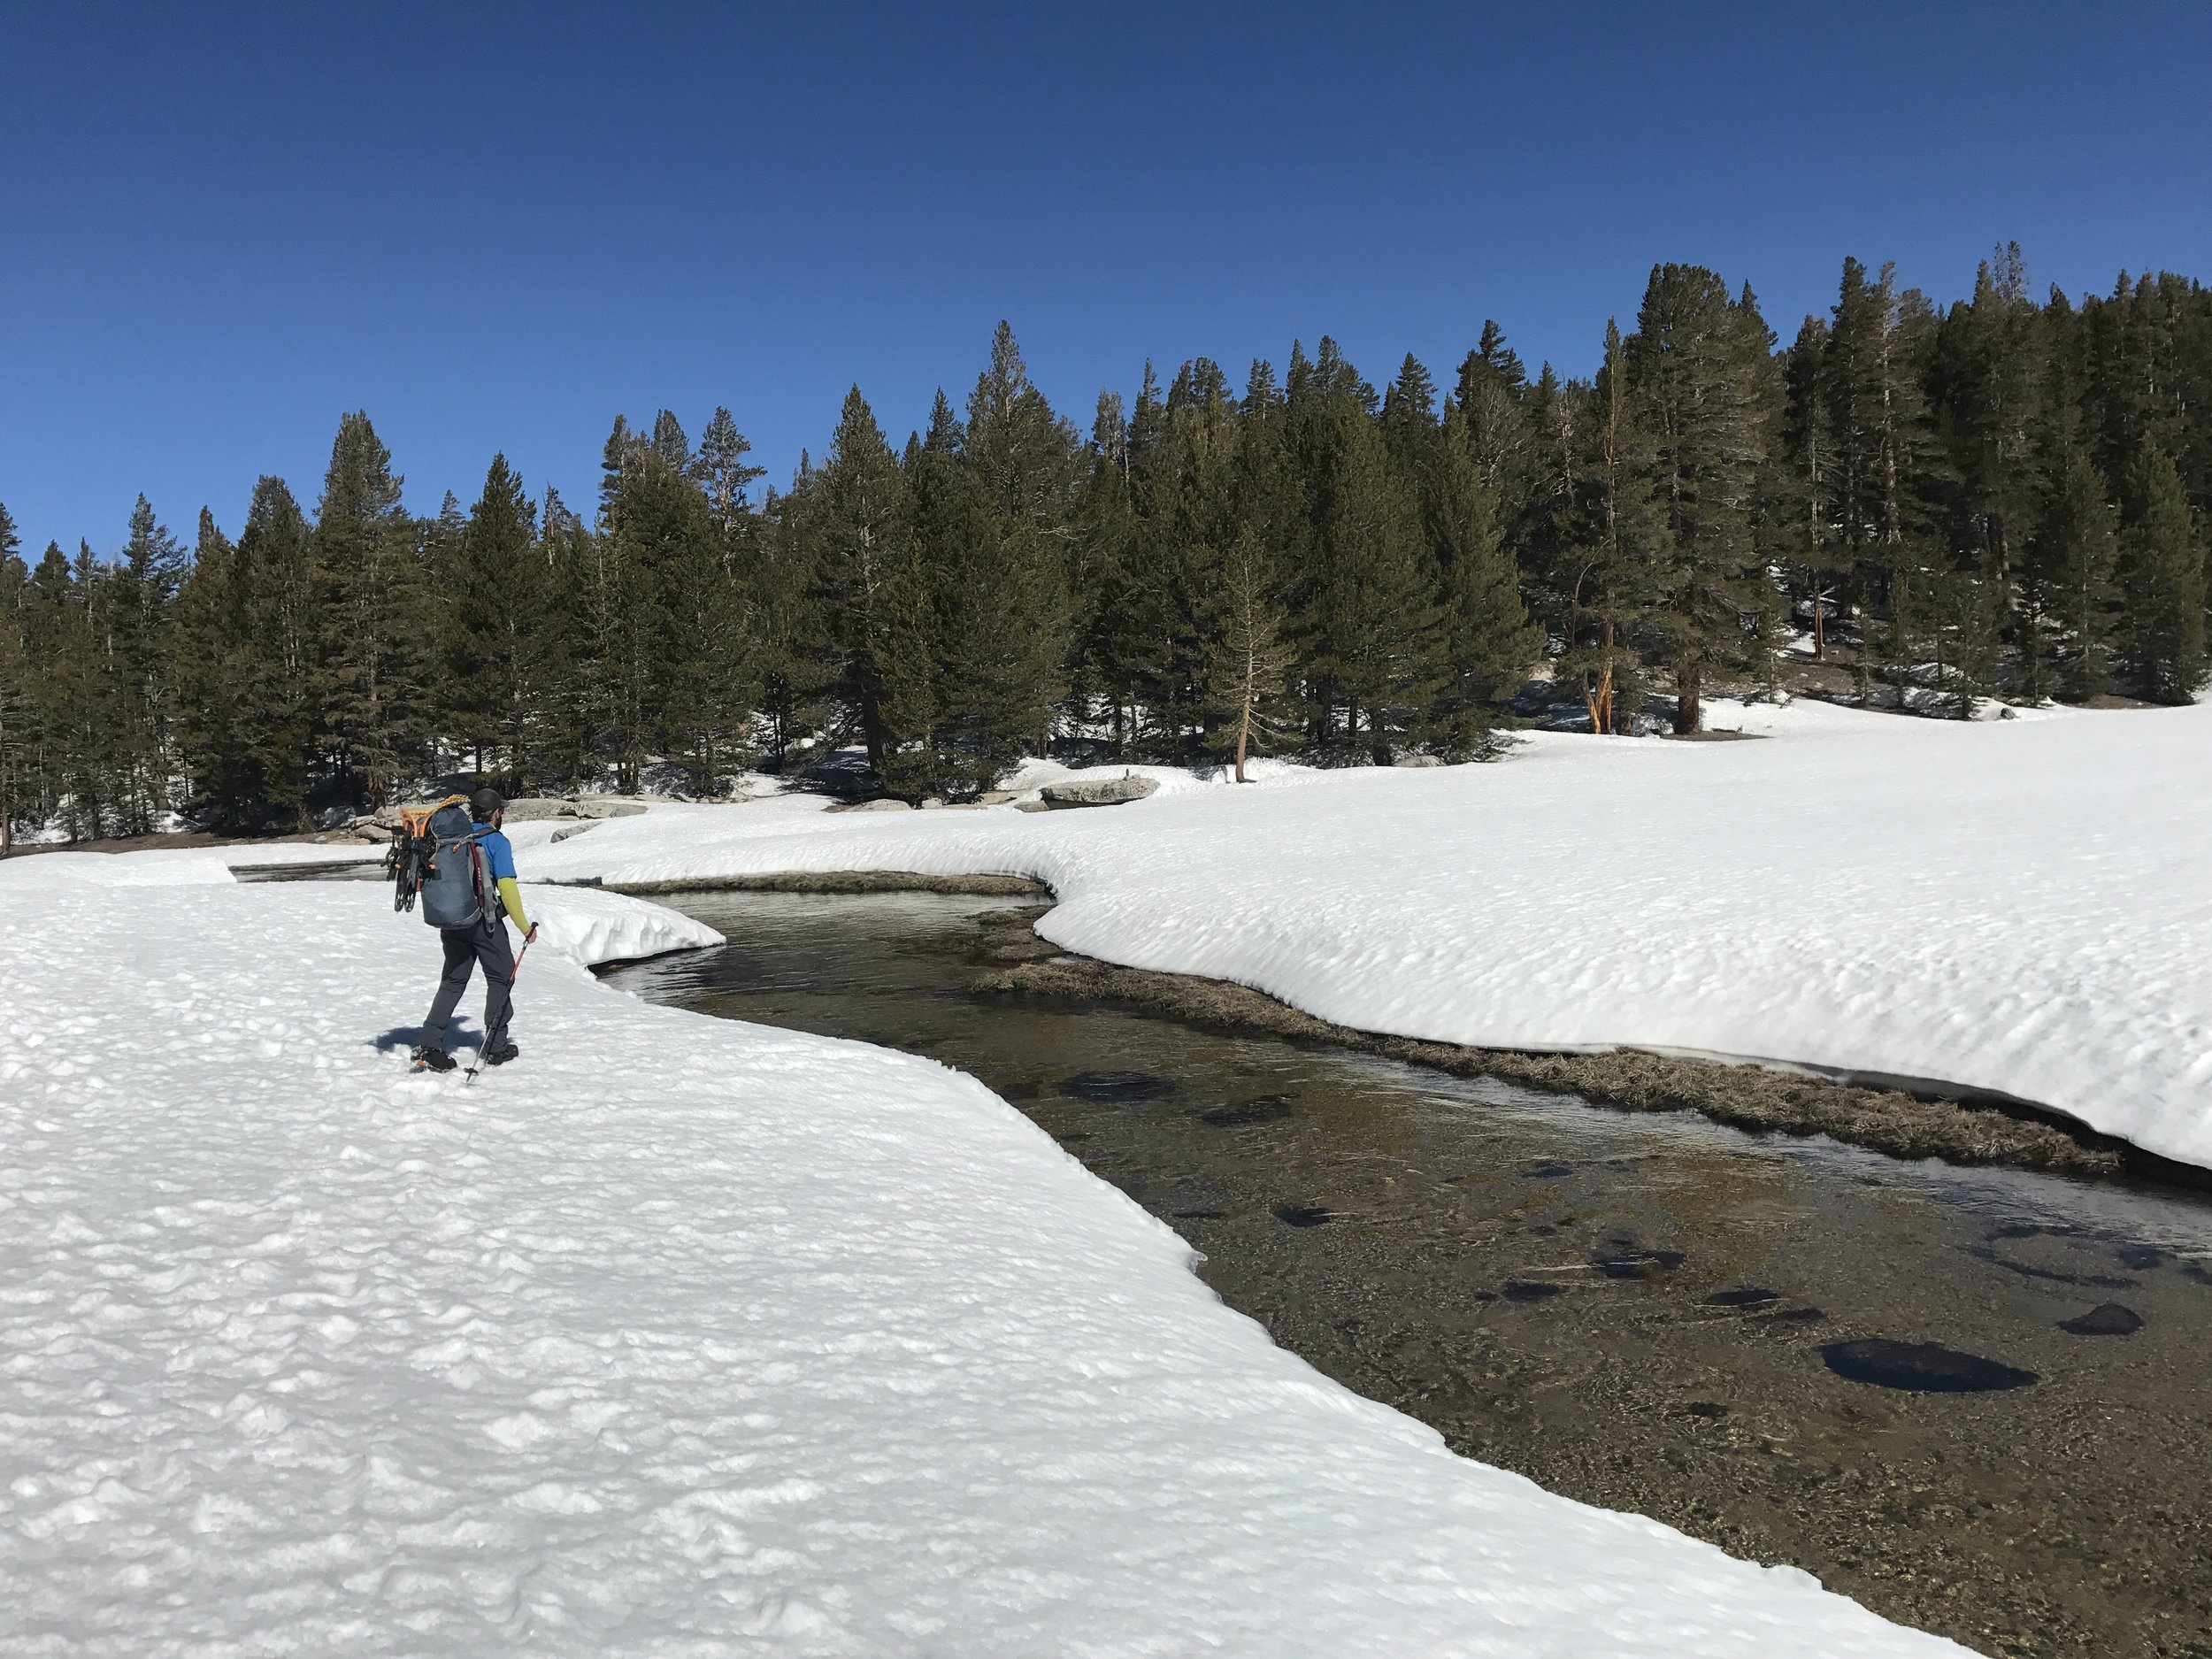 Looking for snowbridges in Crabtree Meadow.